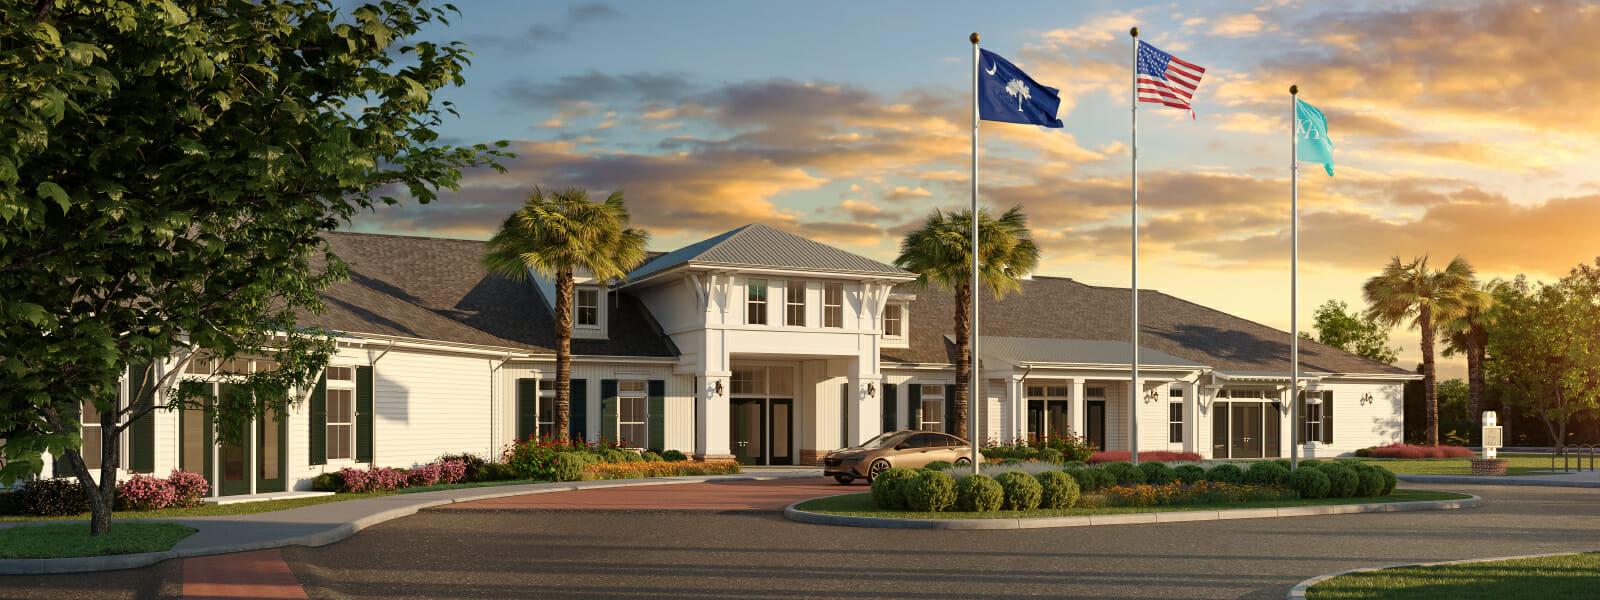 55+ Community Bluffton SC | K. Hovnanian at Carolina Oaks | Coastal